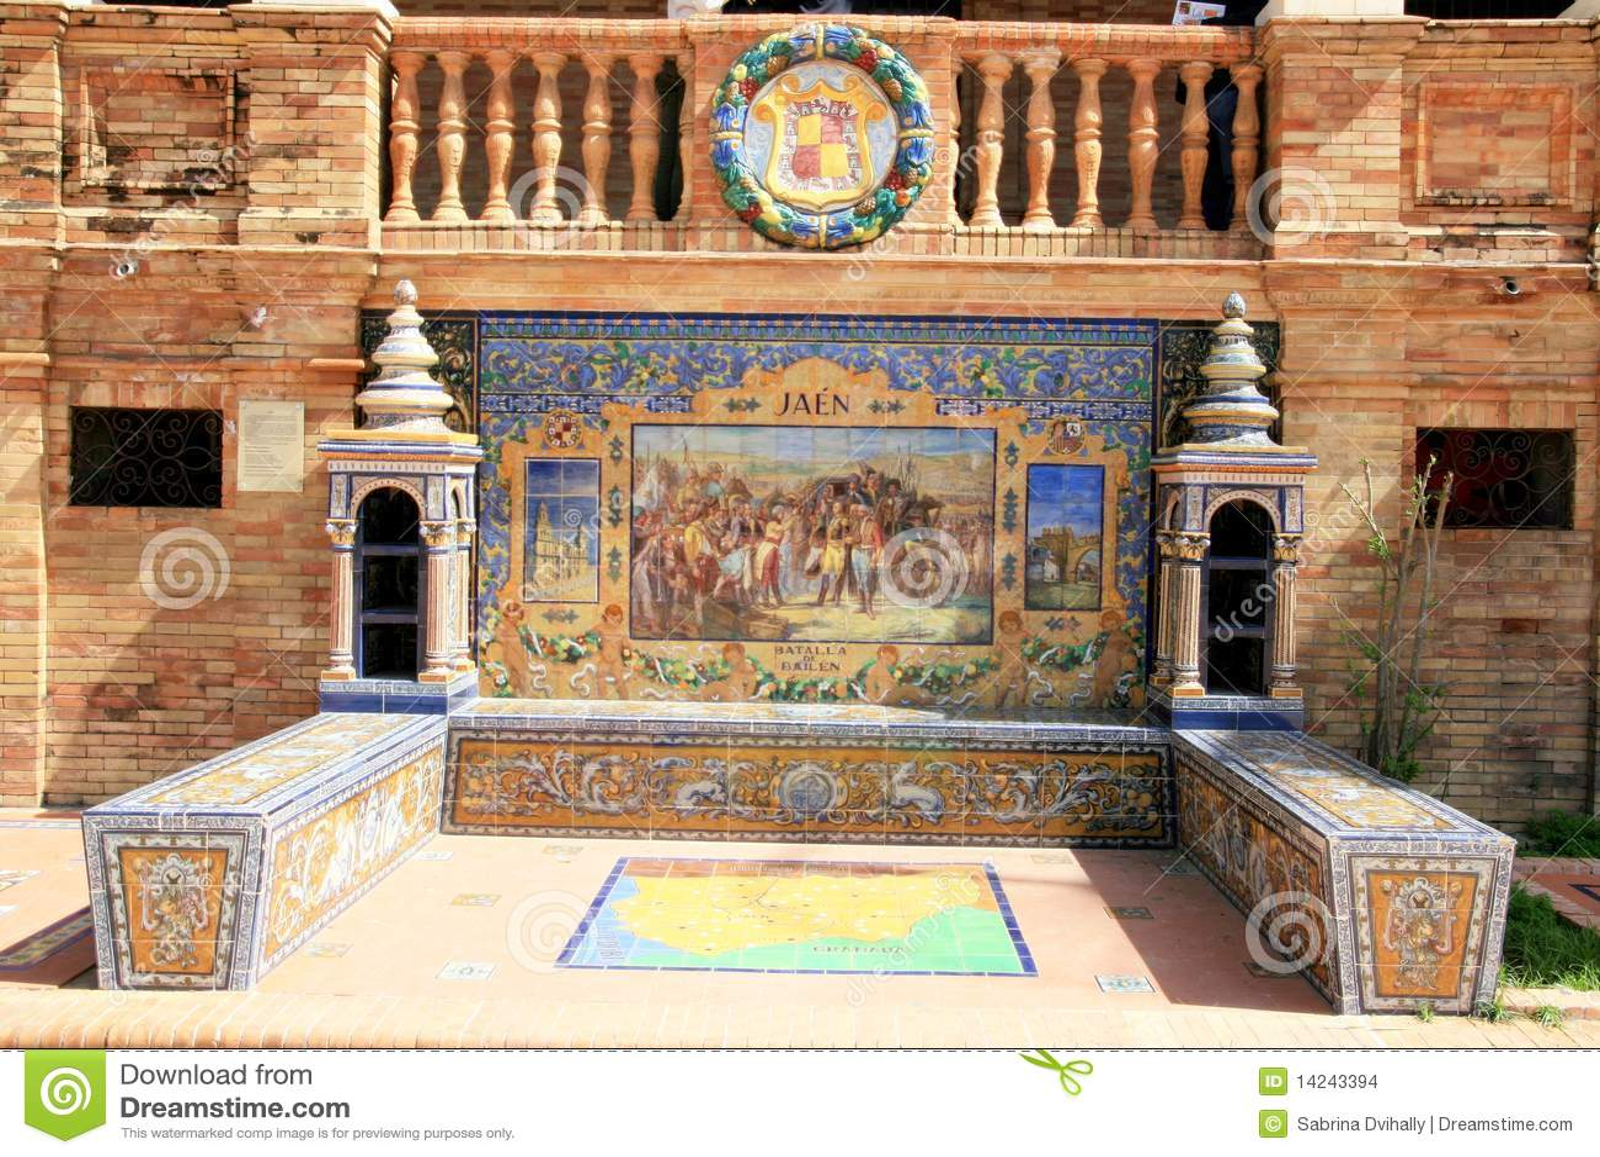 Seville. Plaza Espana typical ceramics azulejos